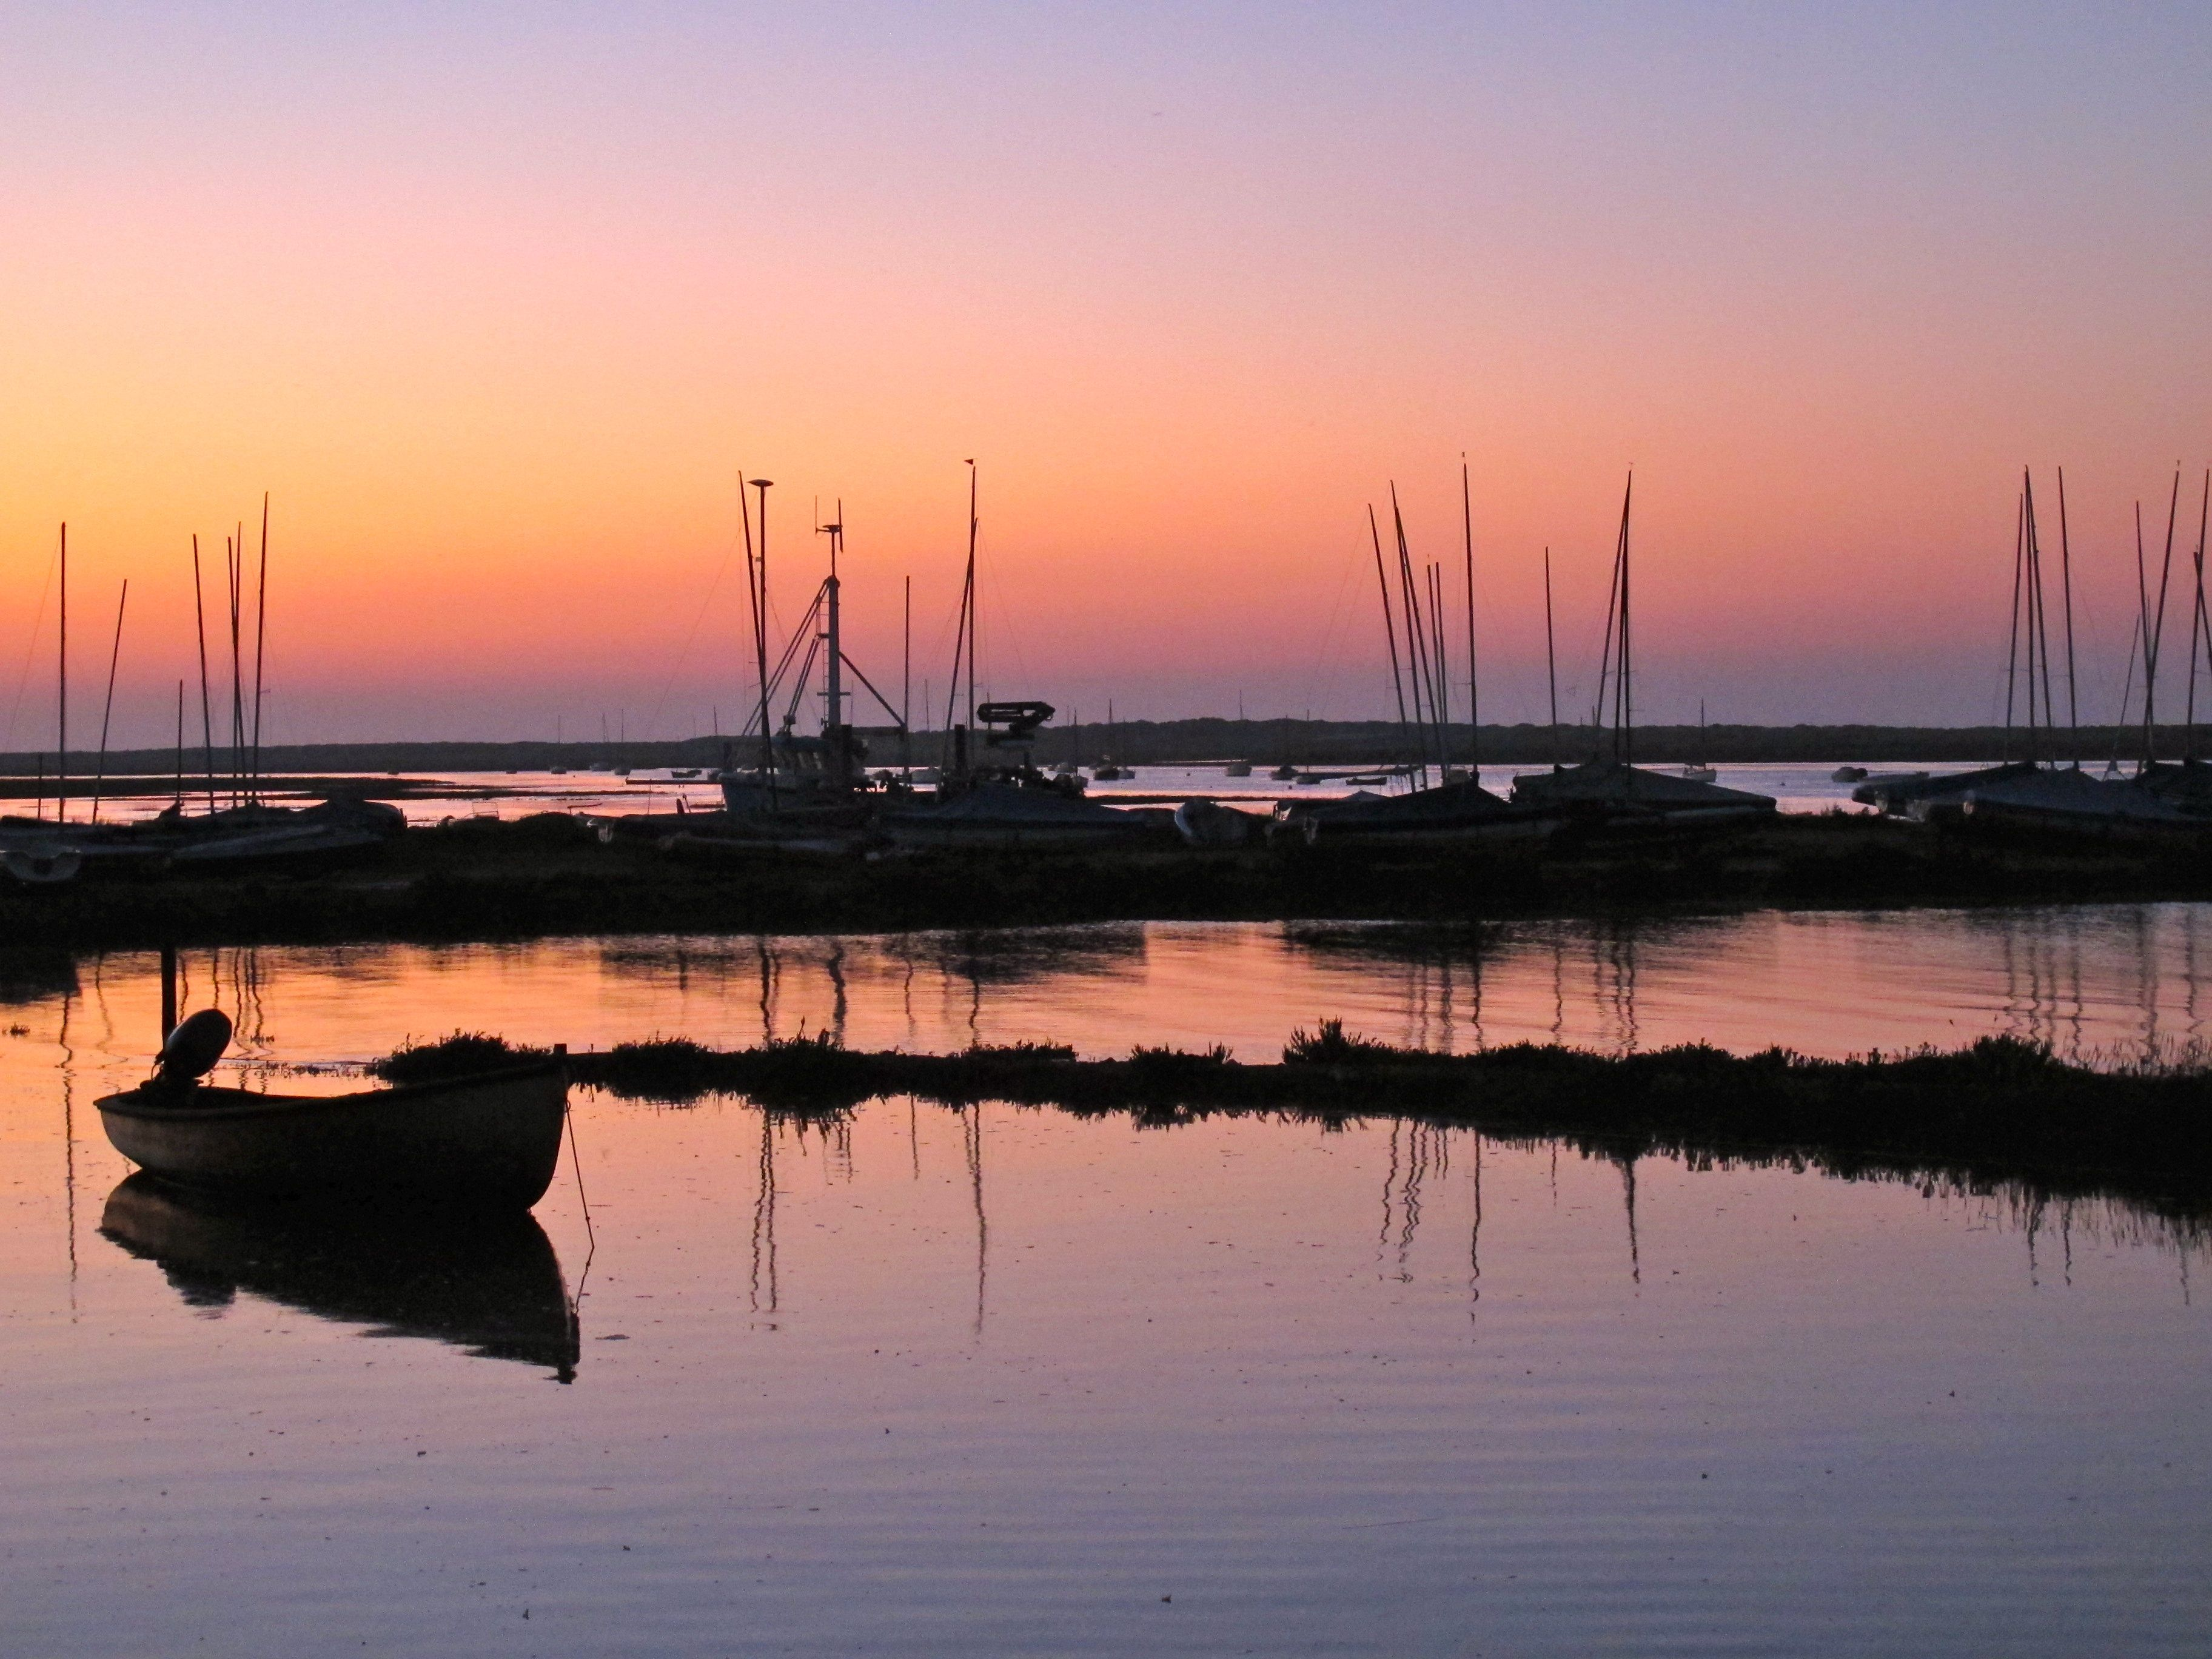 Sunset at Brancaster Harbour